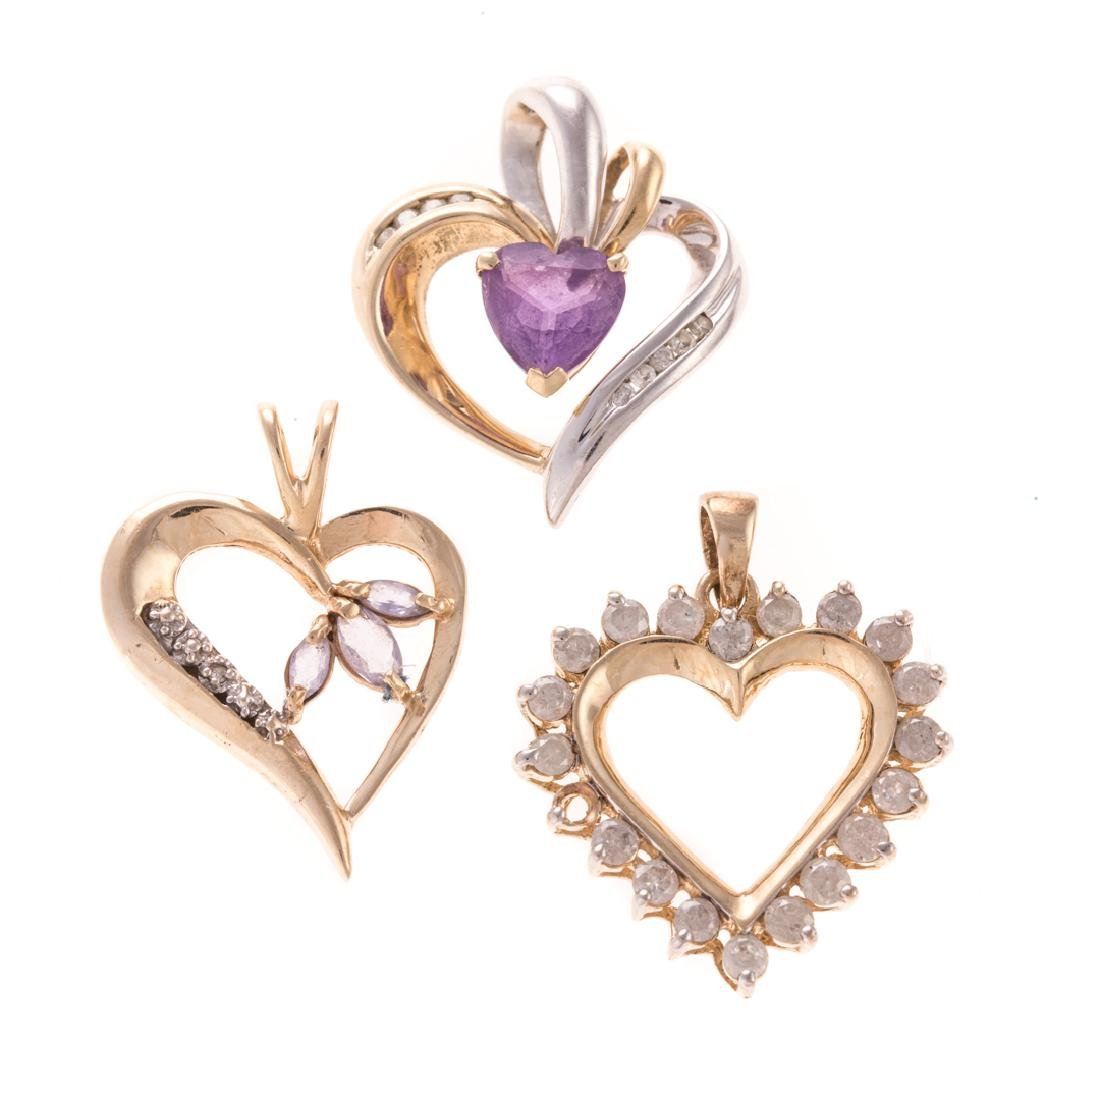 A Trio of Lady's Diamond & Gemstone Heart Pendants